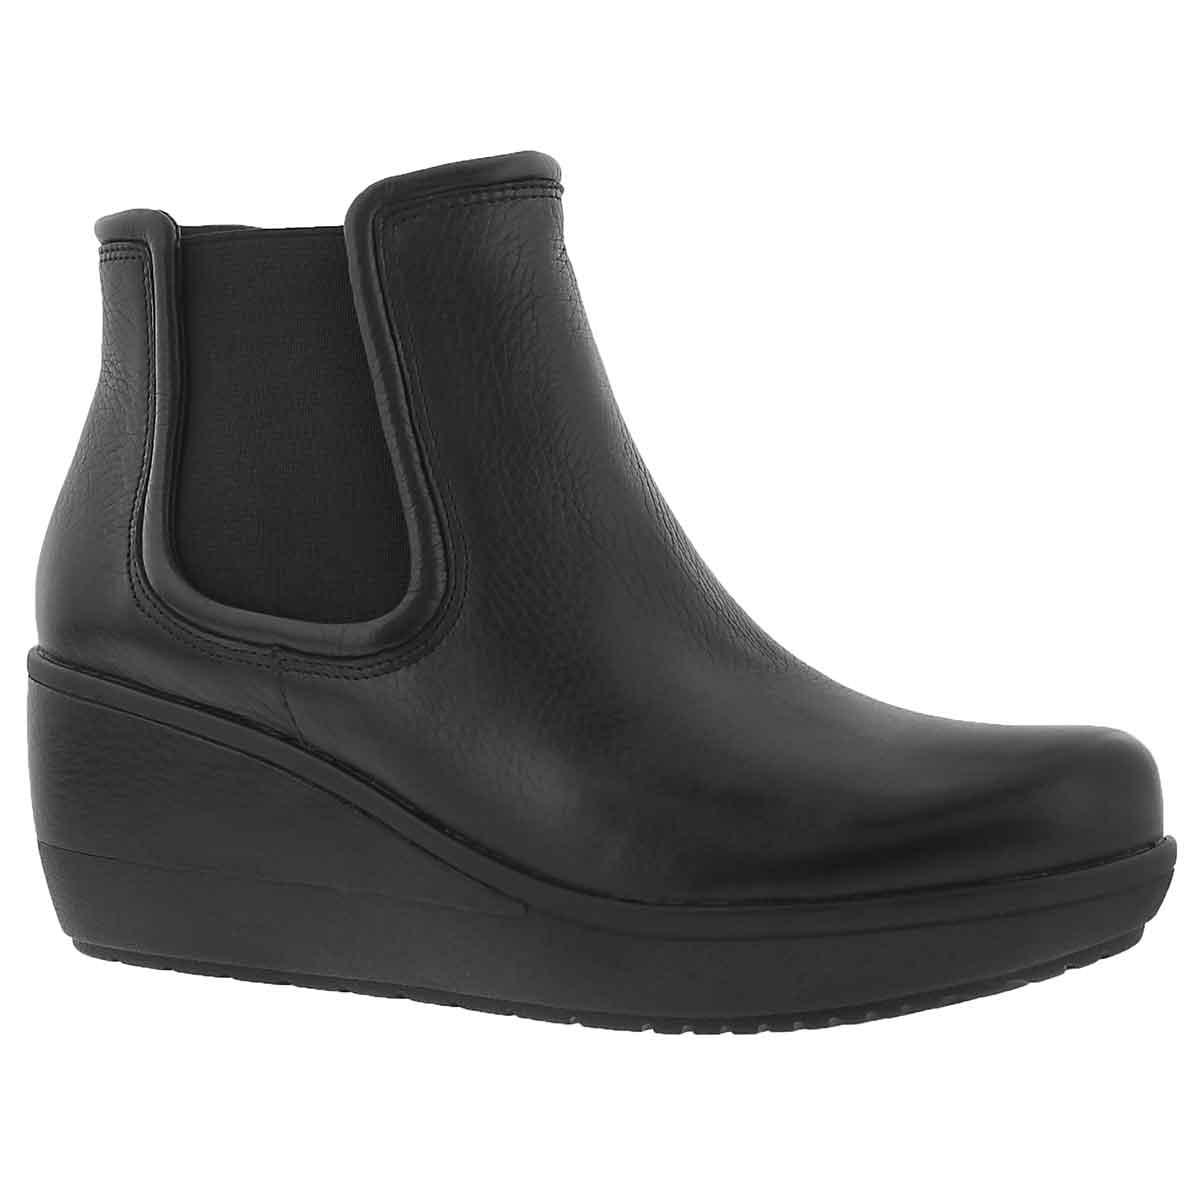 Women's WYNNMERE MARA black wedge ankle boots